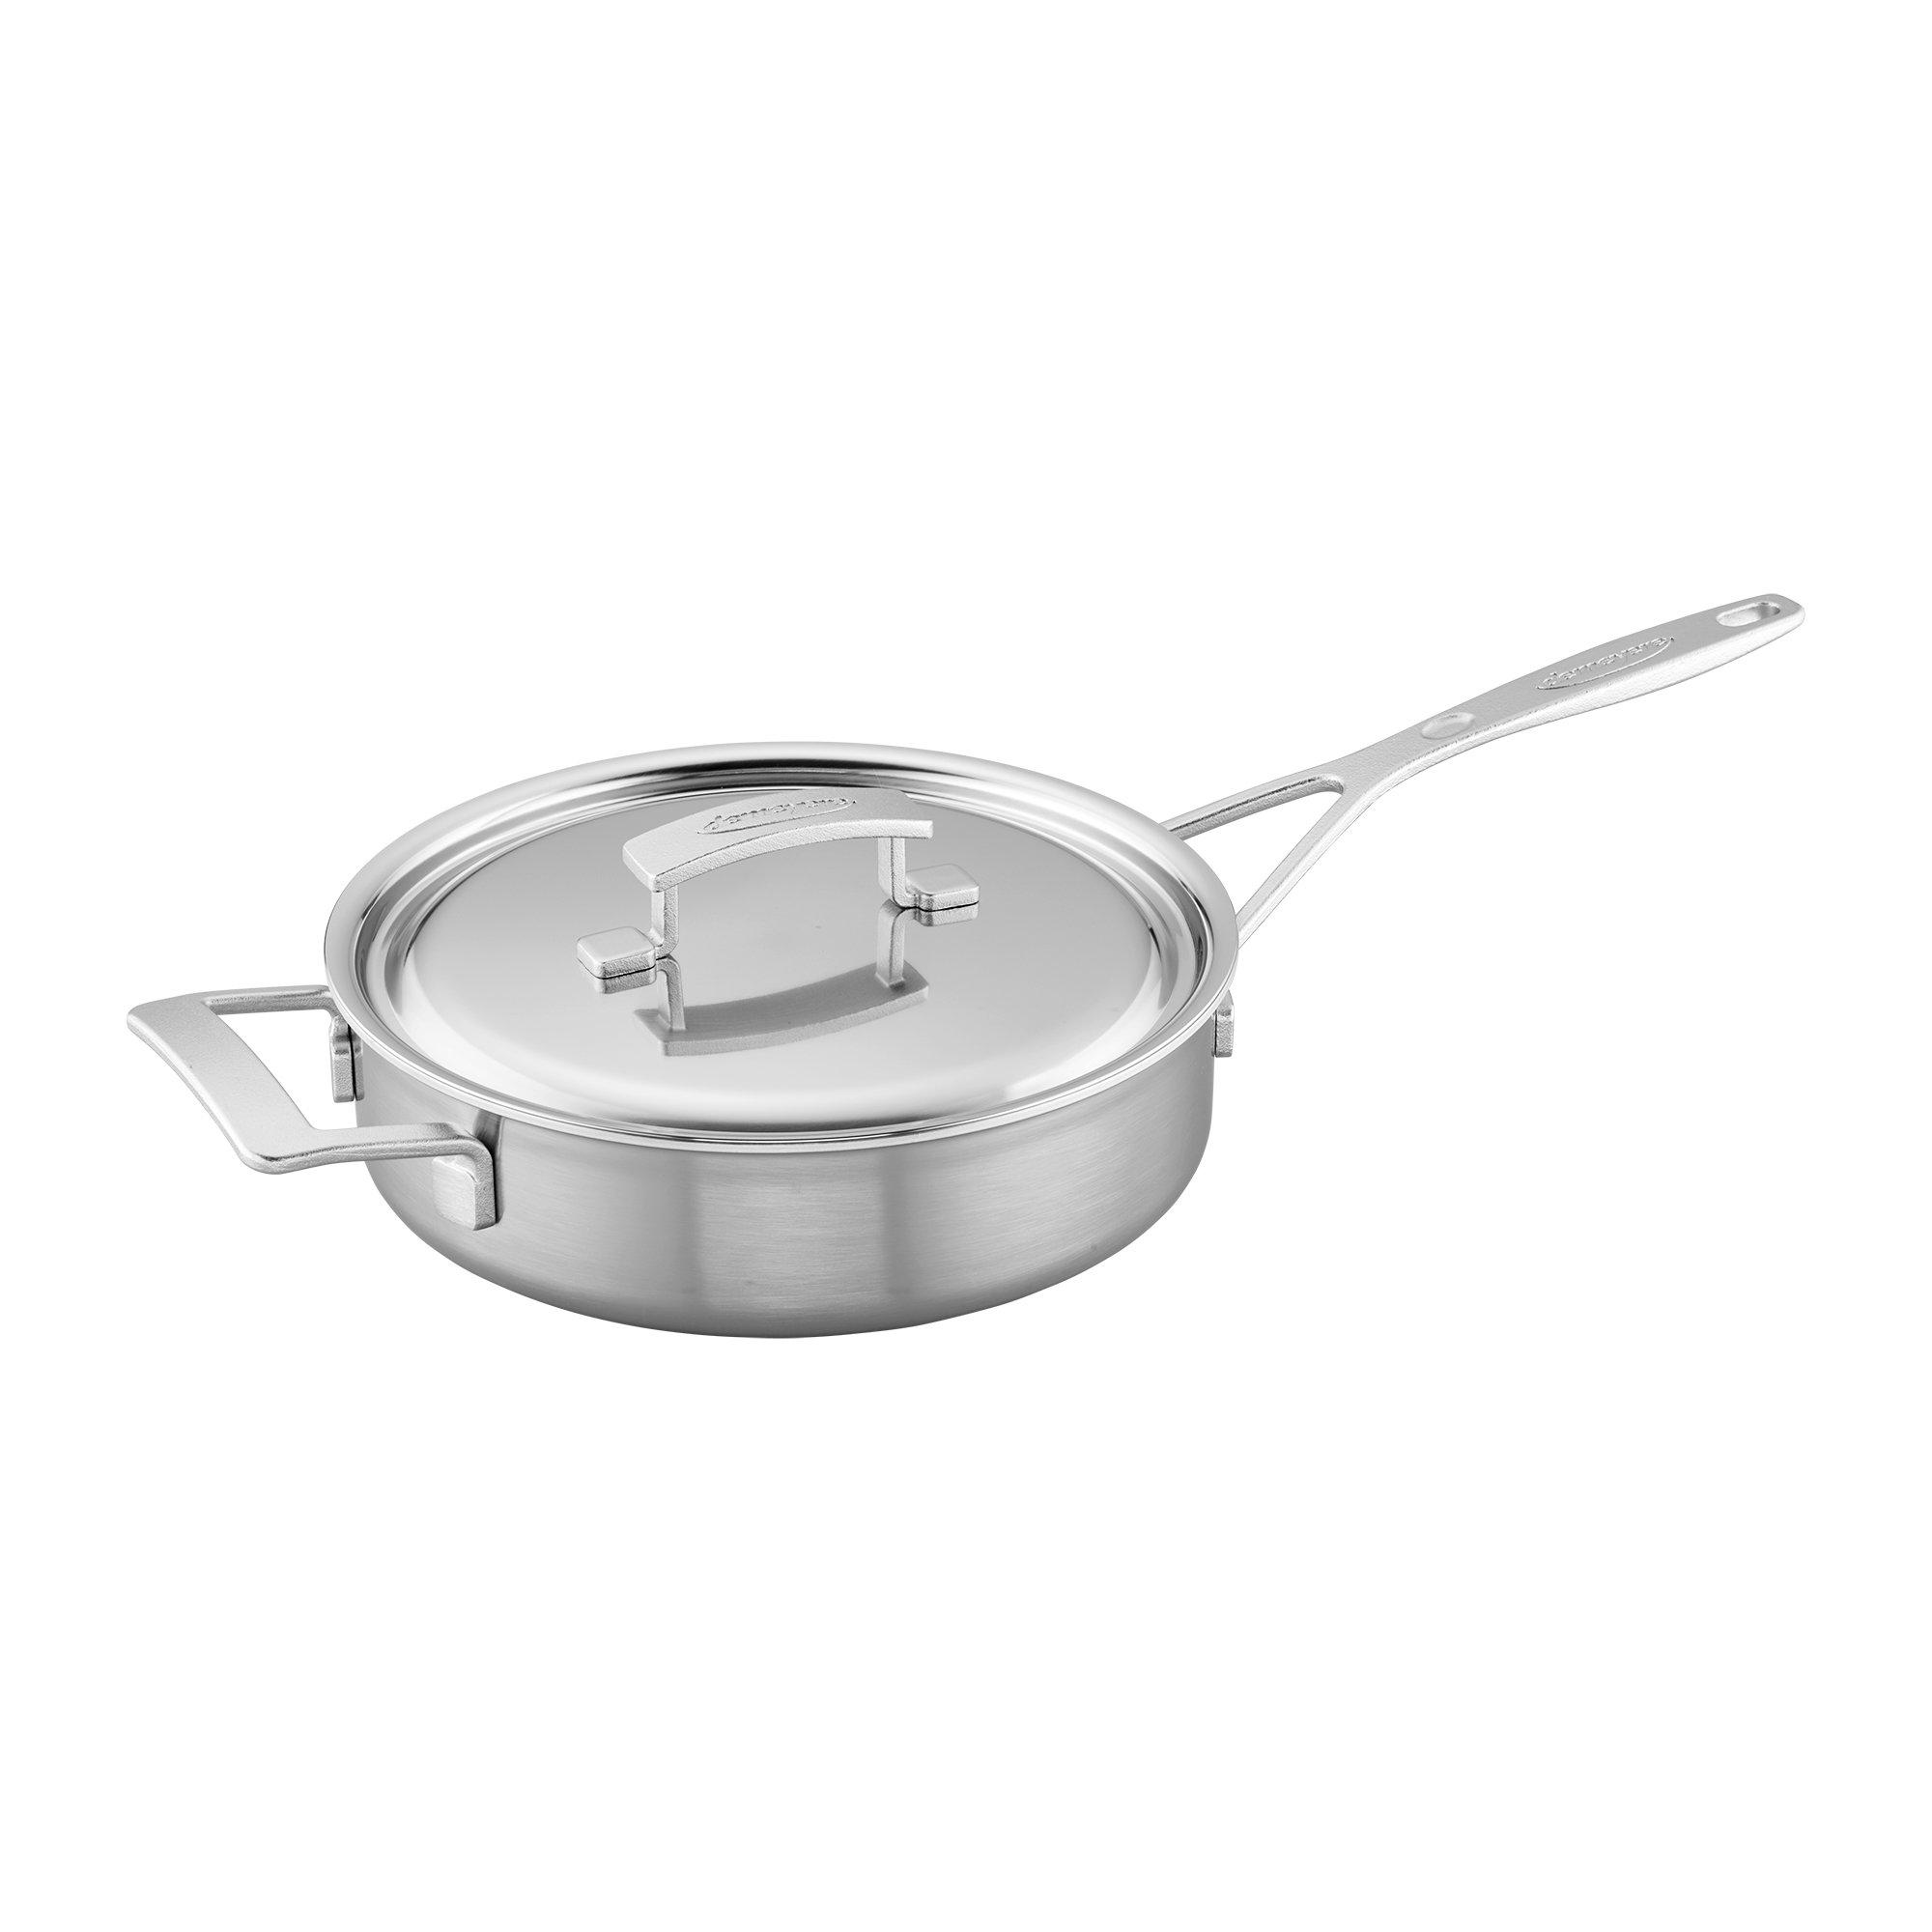 Demeyere Industry 5-Ply 3-qt Stainless Steel Saute Pan by Demeyere